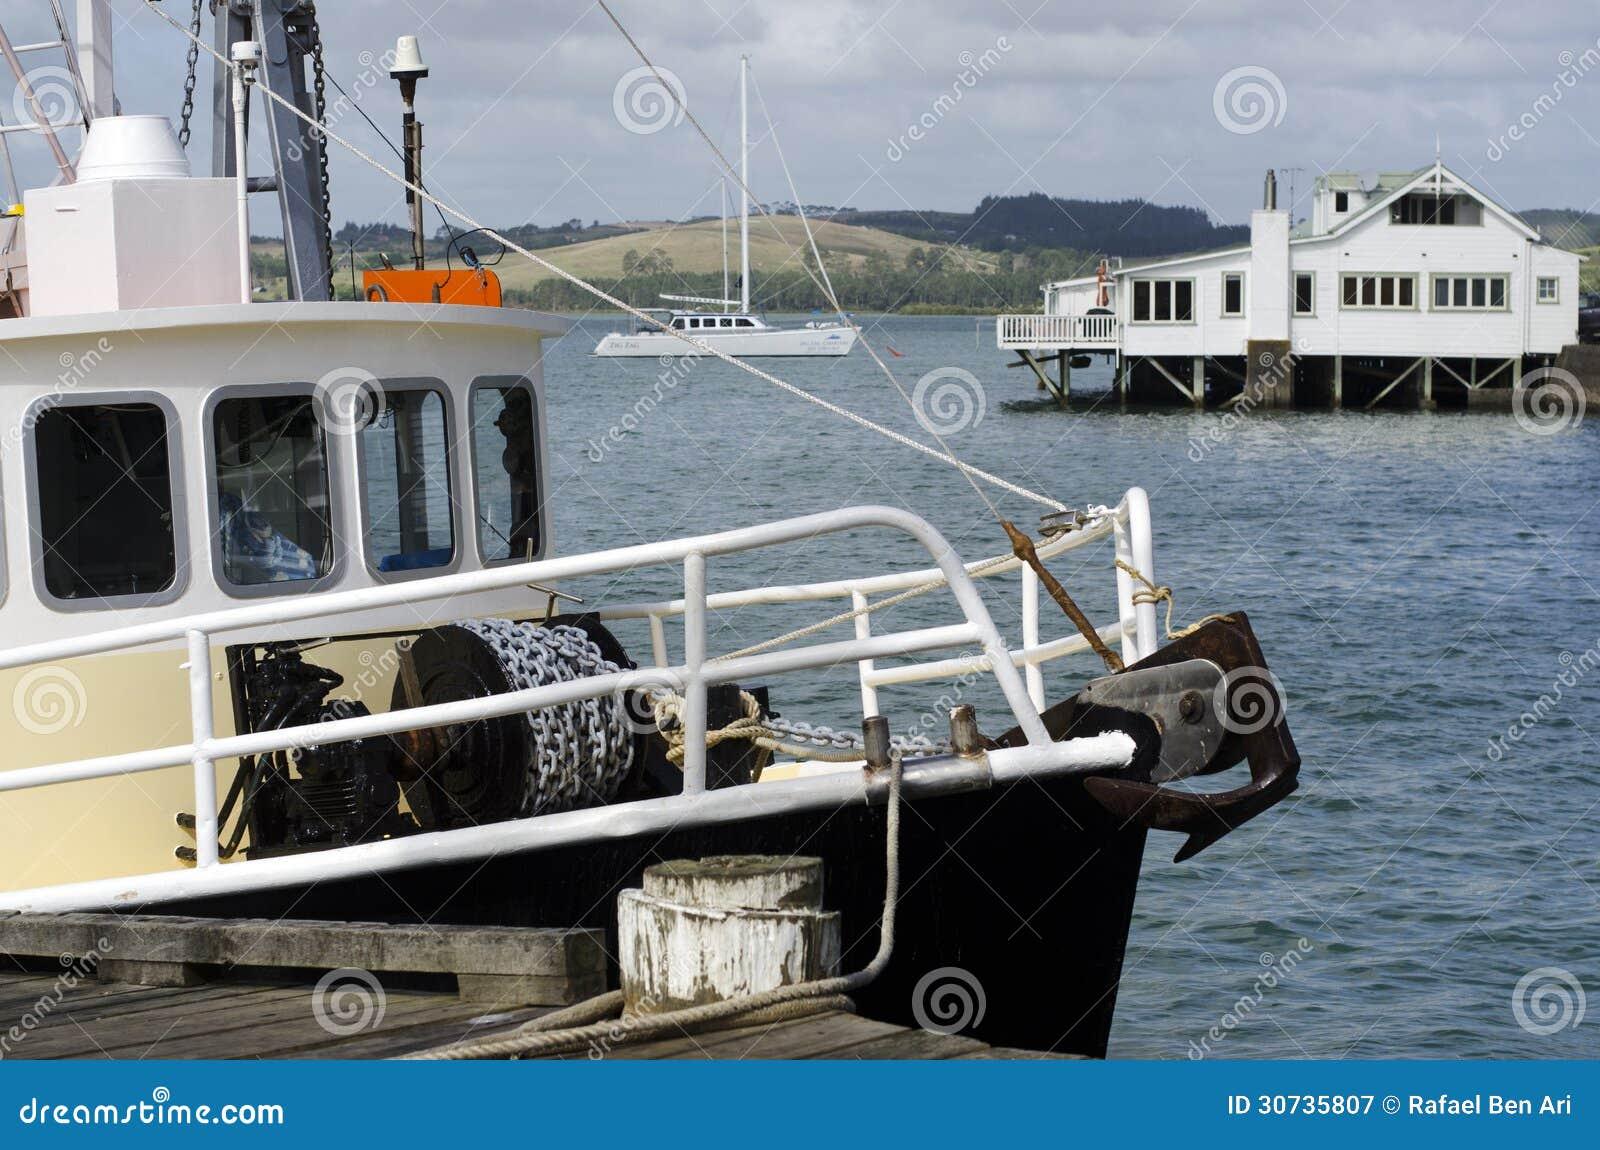 Mangonui New Zealand  City pictures : Mangonui Harbor, New Zealand Royalty Free Stock Photography Image ...